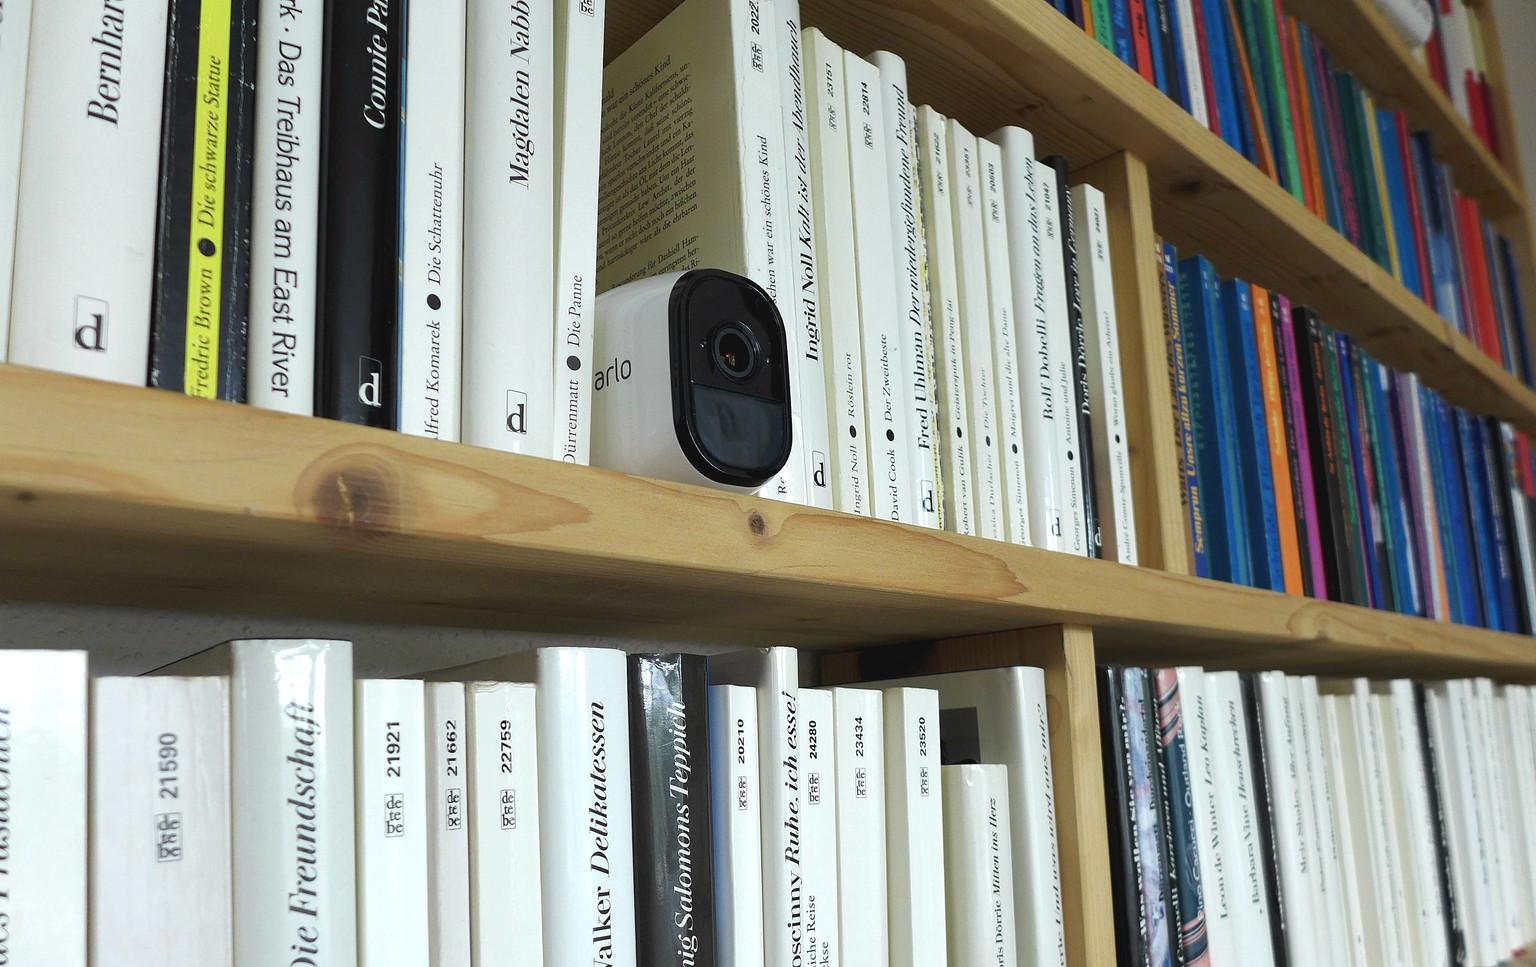 Mini Kühlschrank Digitec : Die home security kamera arlo pro von netgear im praxistest watson